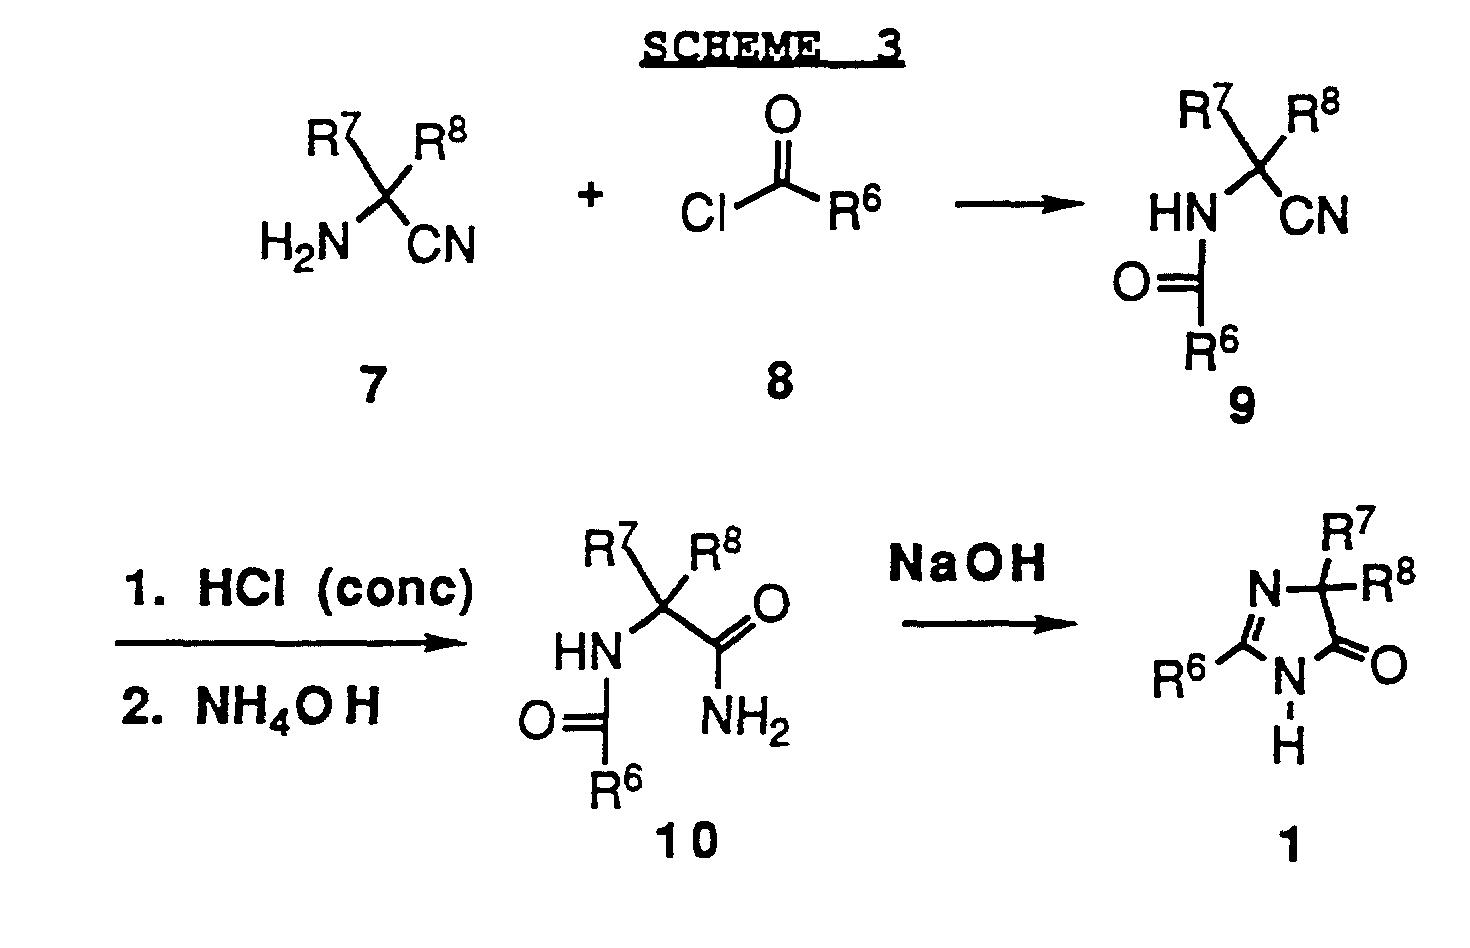 sodium chloride dot diagram ezgo wiring electric golf cart patent ep0599999a1 angiotensin ii receptor blocking